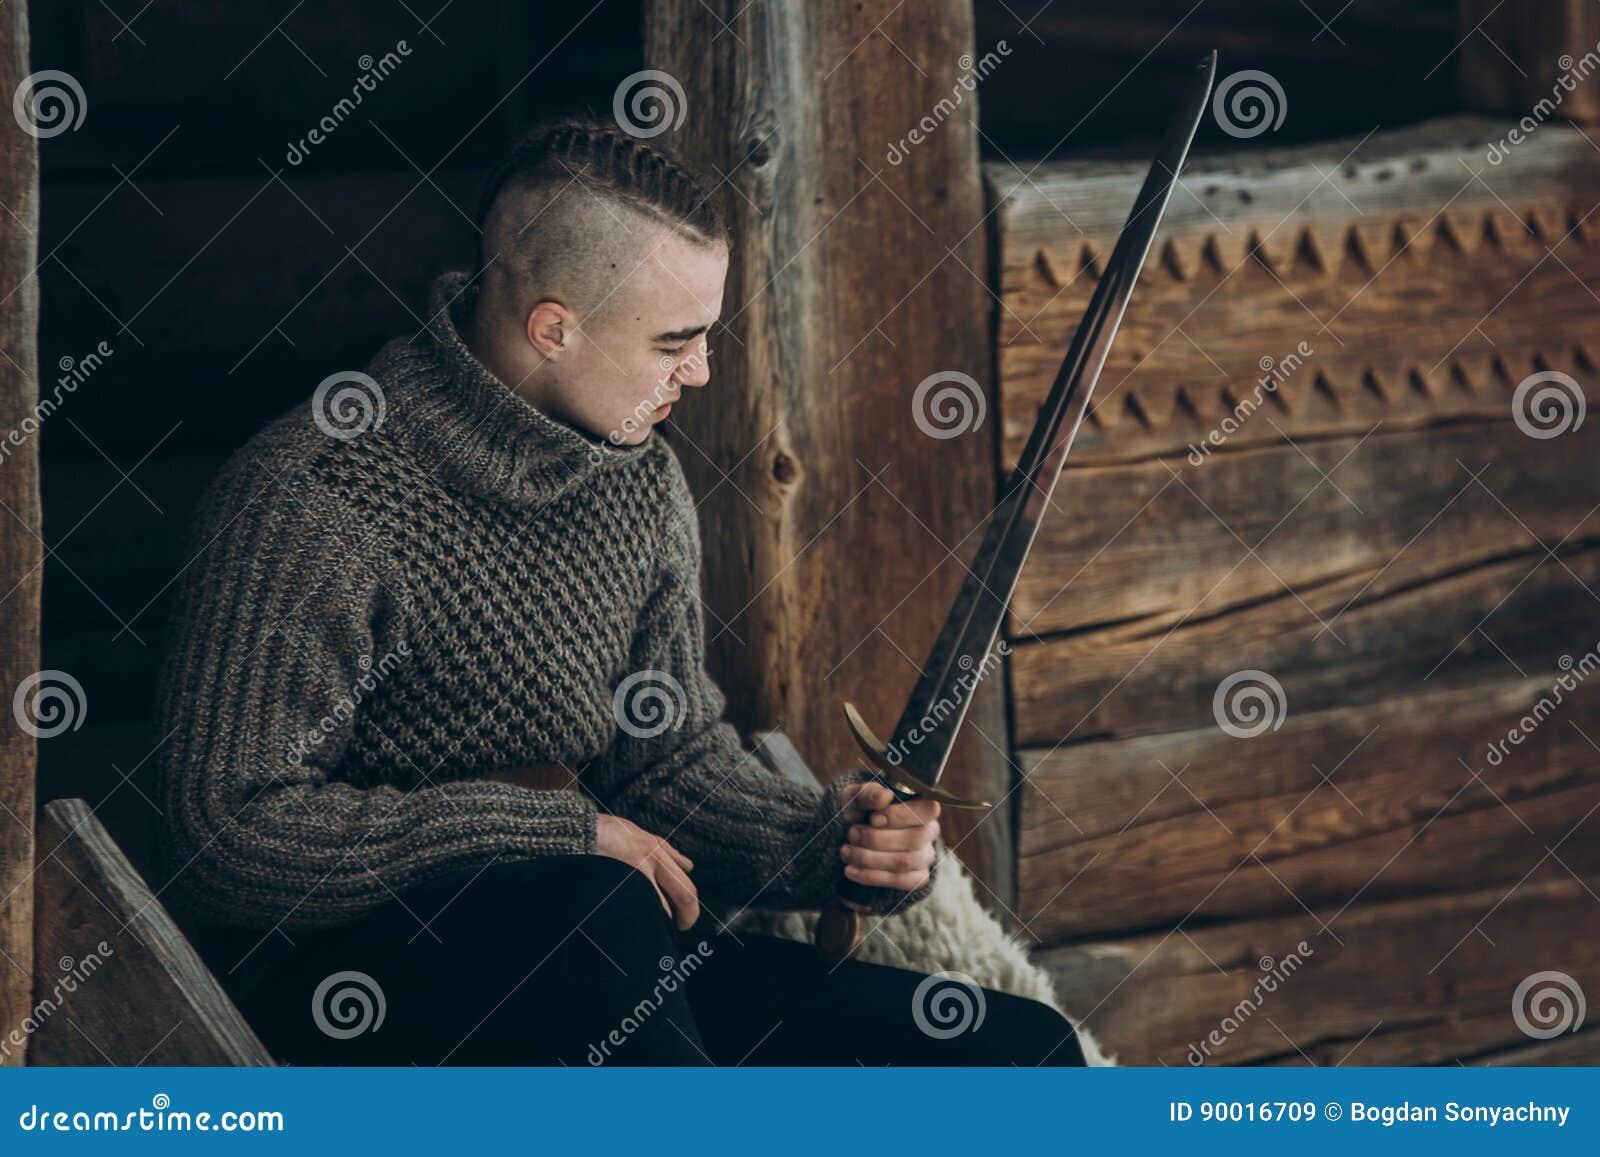 Brave warrior holding sword near historical wood castle building